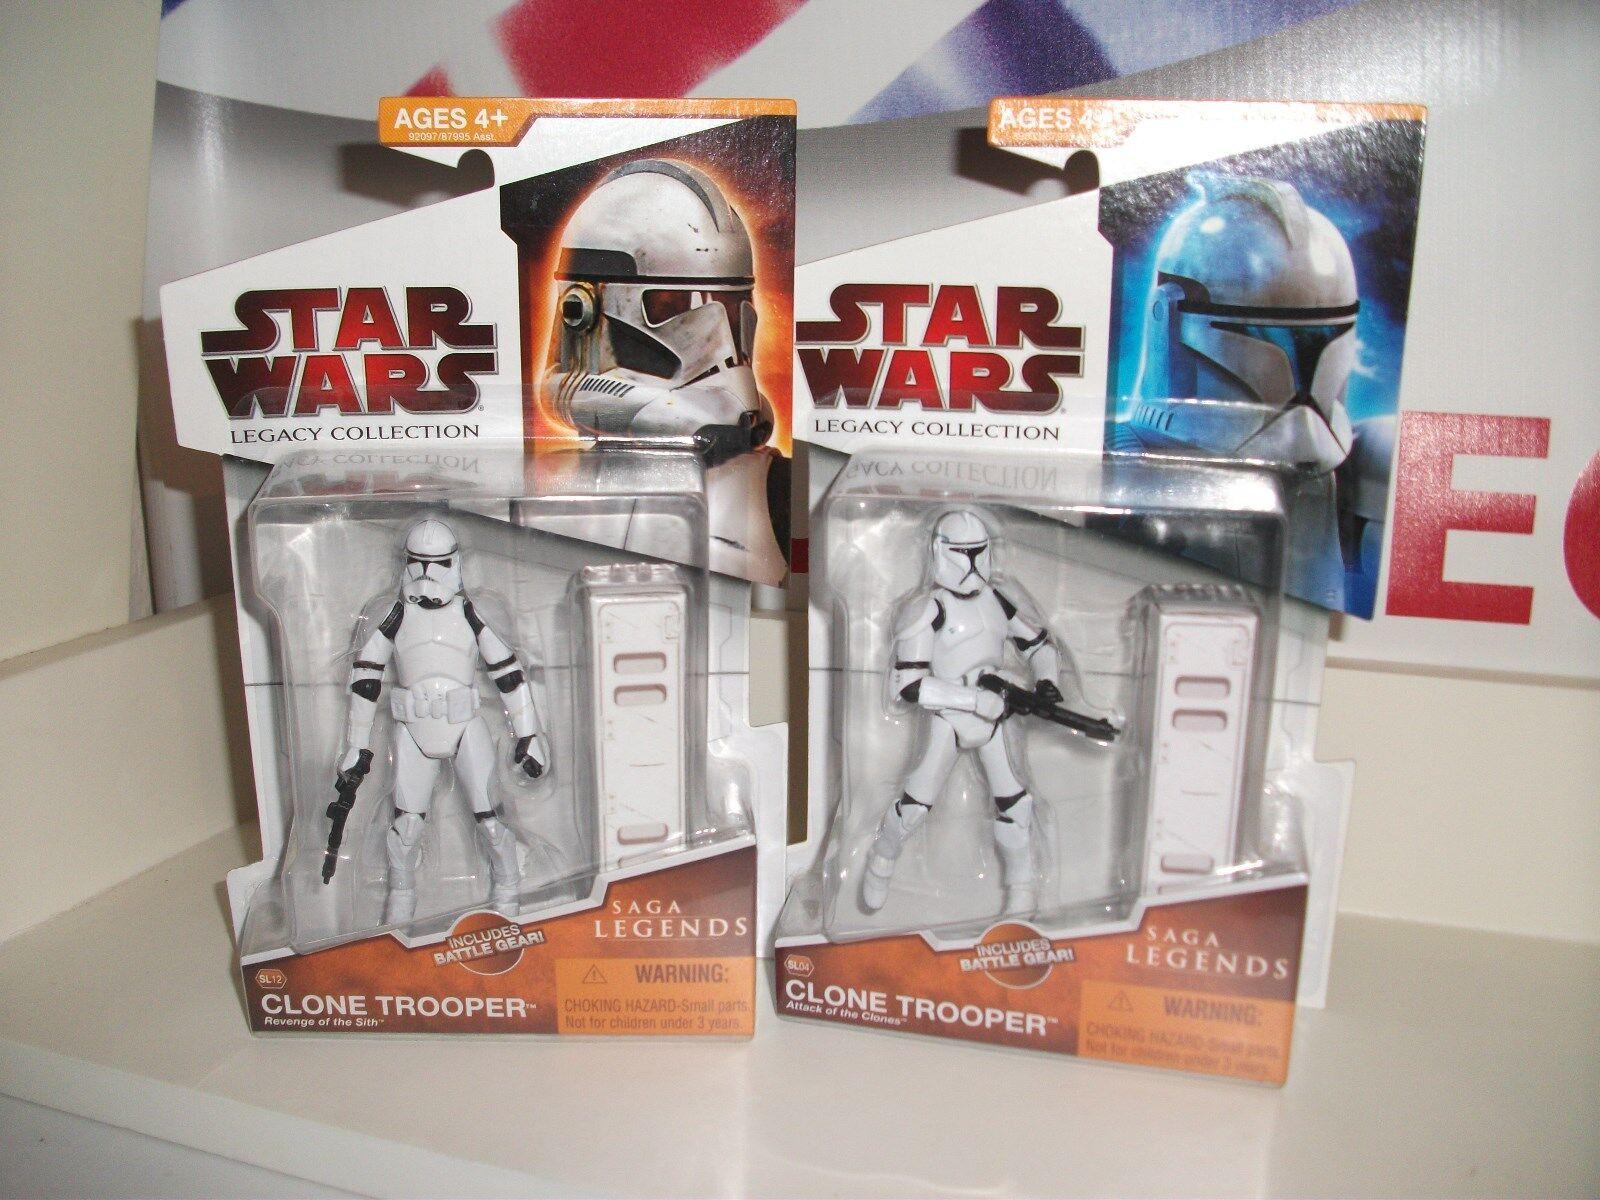 Star wars saga legends CLONE TROOPER job lot bundle AOTC redS MINT ON CARDS